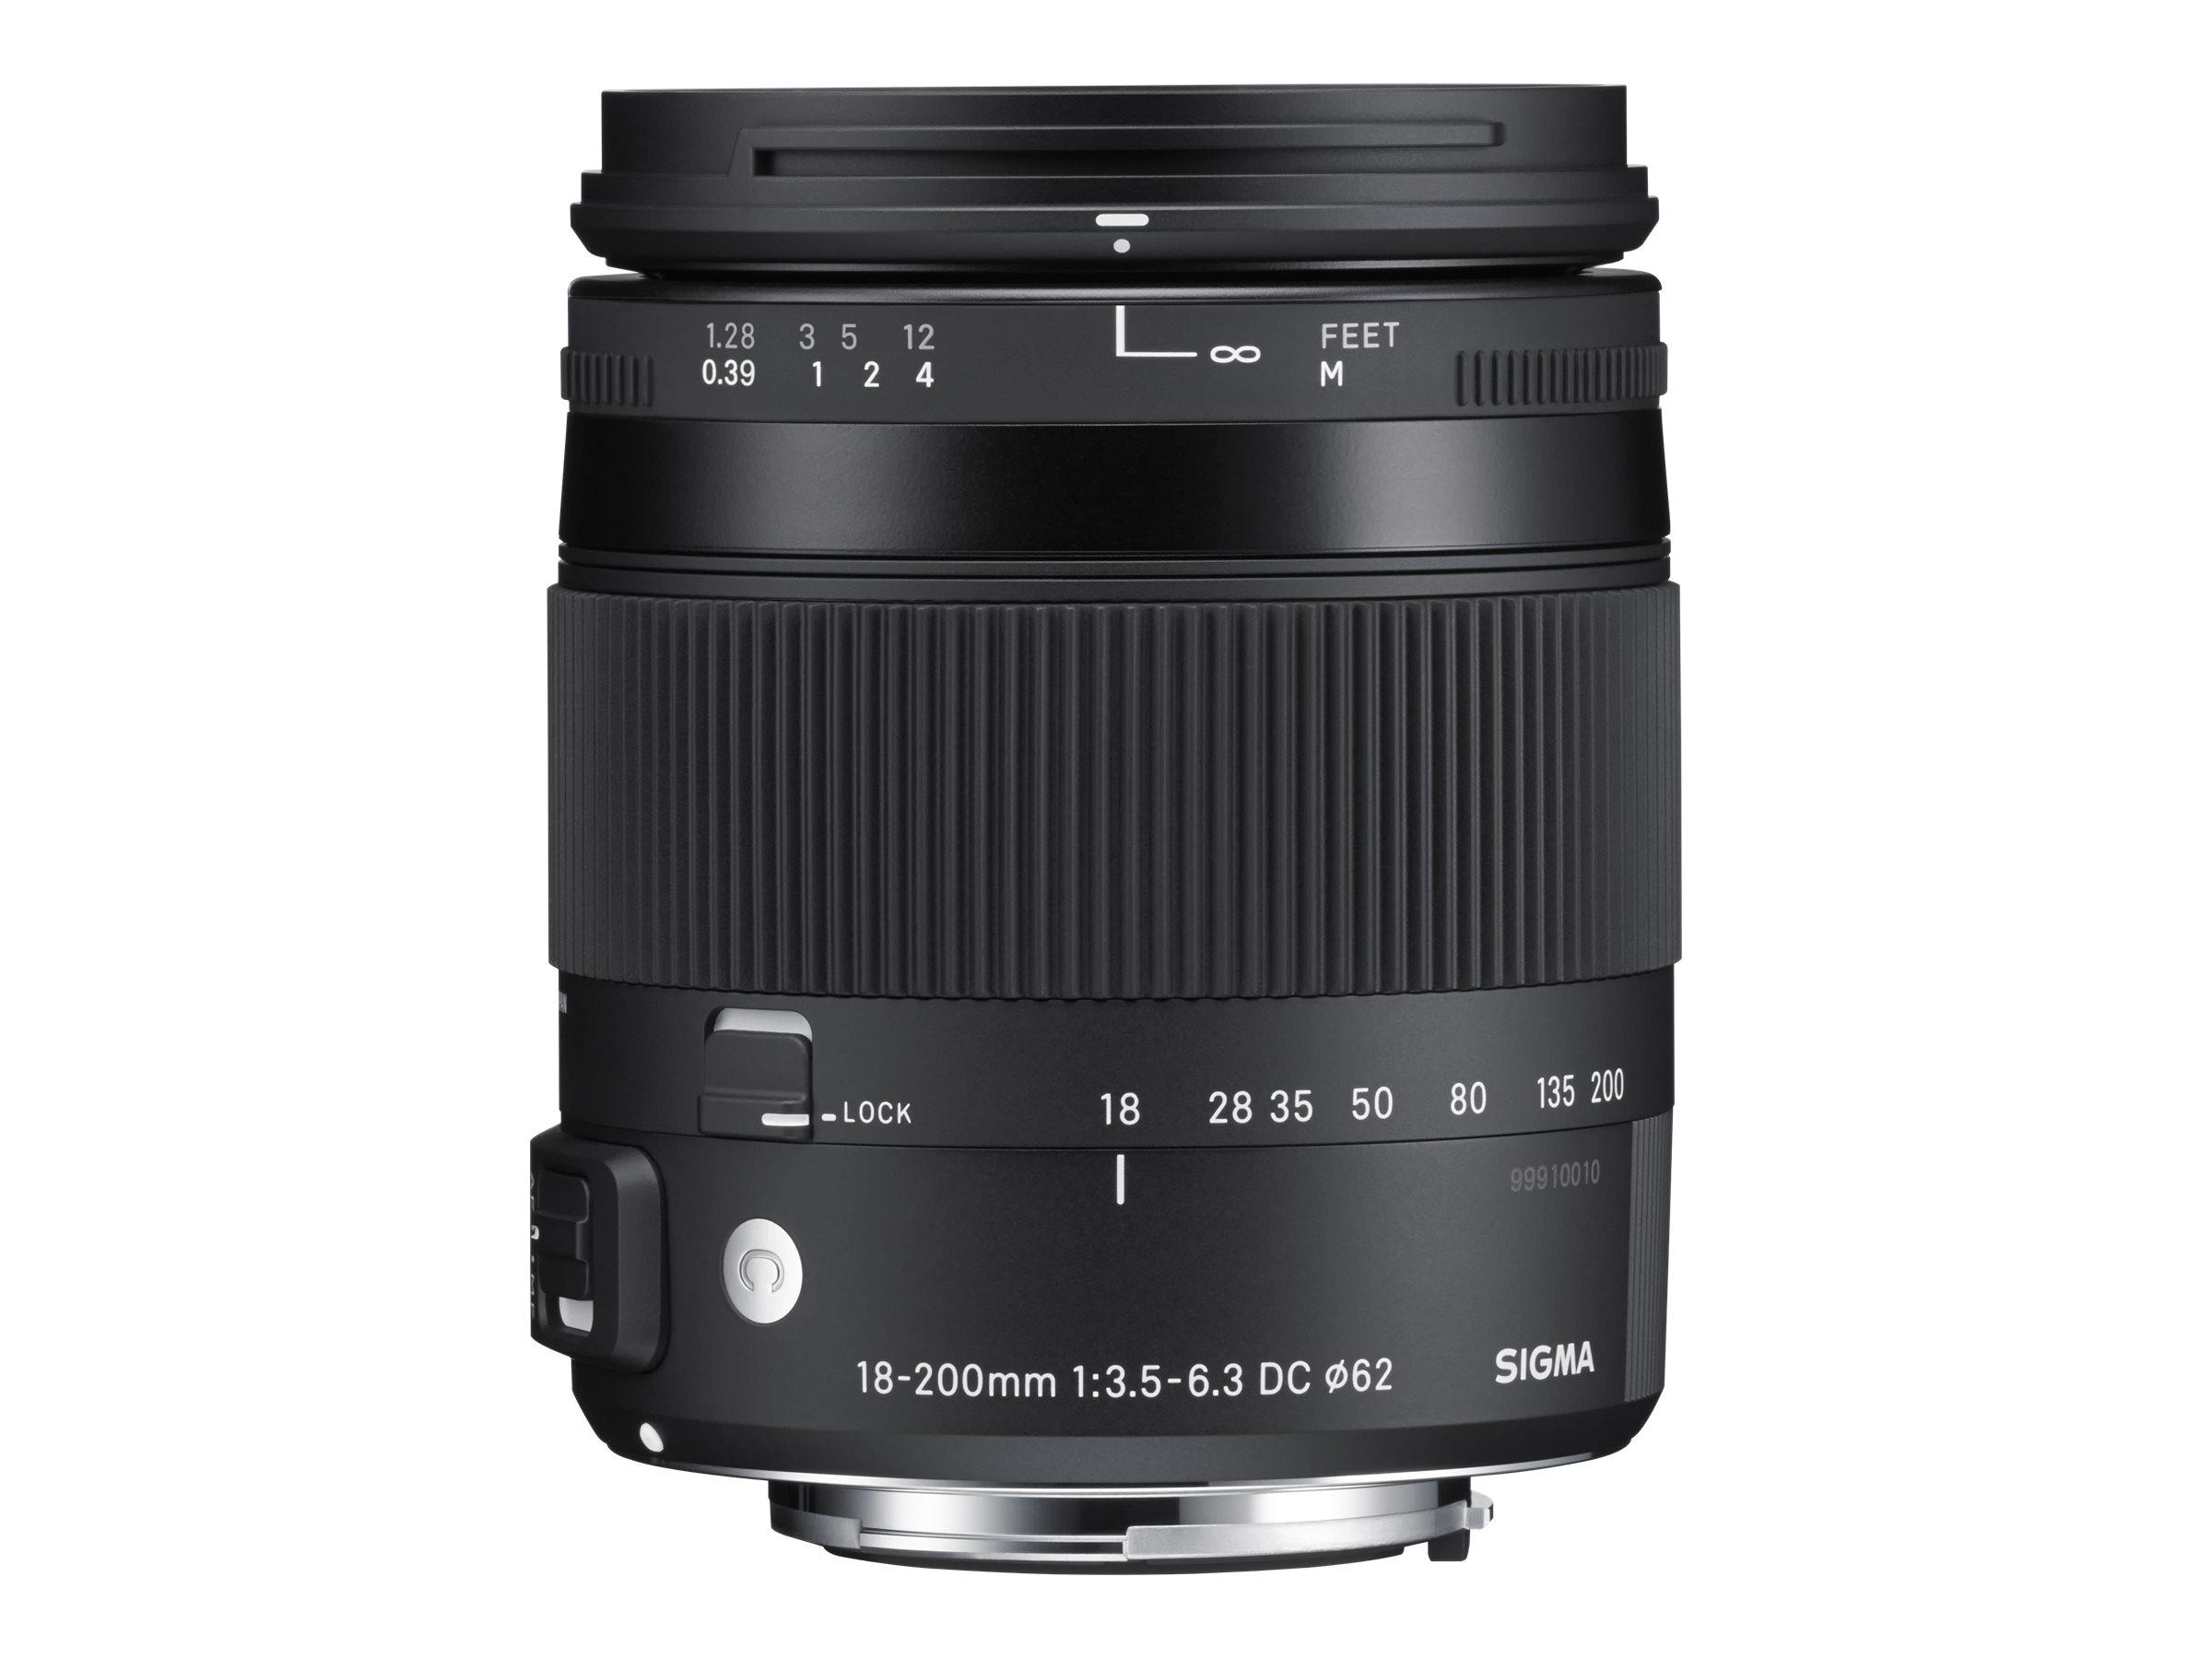 Sigma Contemporary - Zoomobjektiv - 18 mm - 200 mm - f/3.5-6.3 DC Macro OS HSM - Nikon F